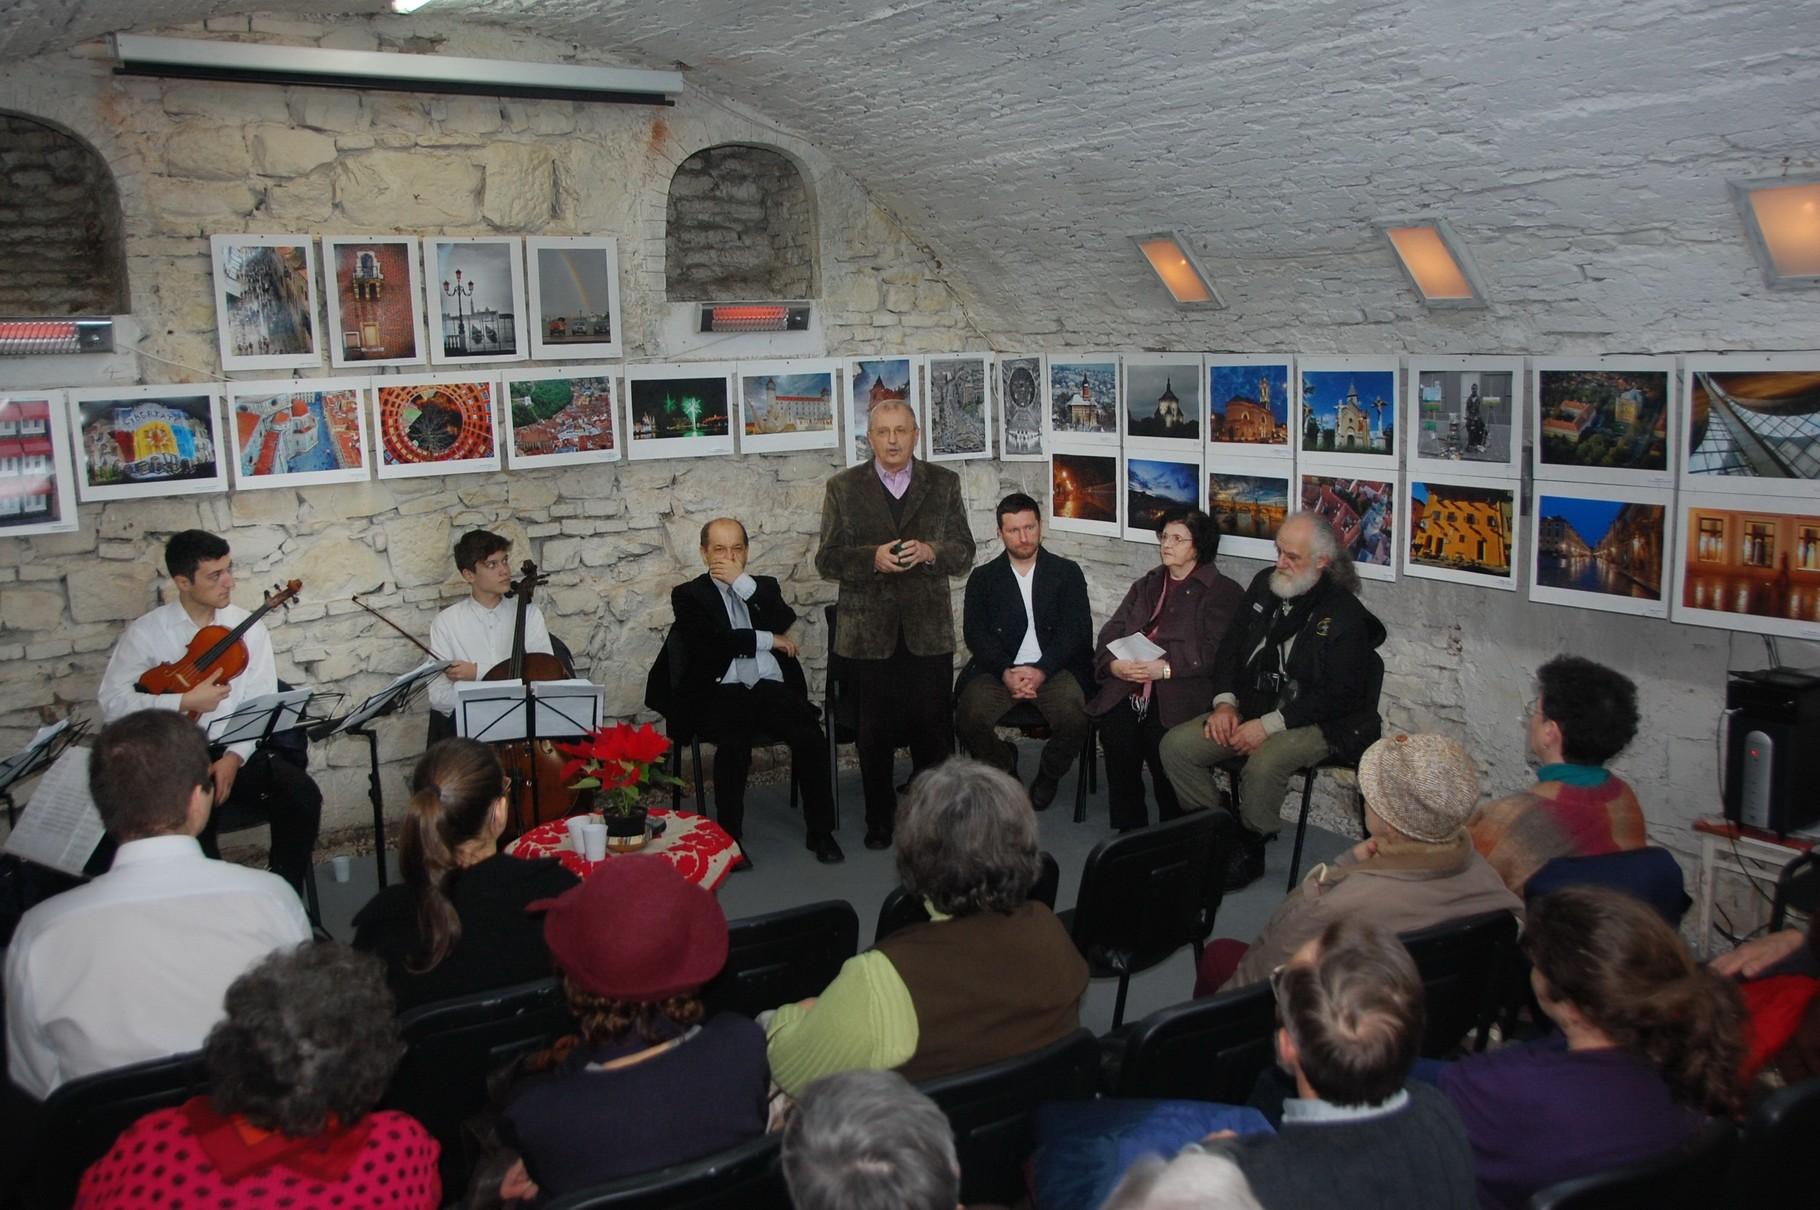 2014.21.01 - Cluj Napoca (RO)